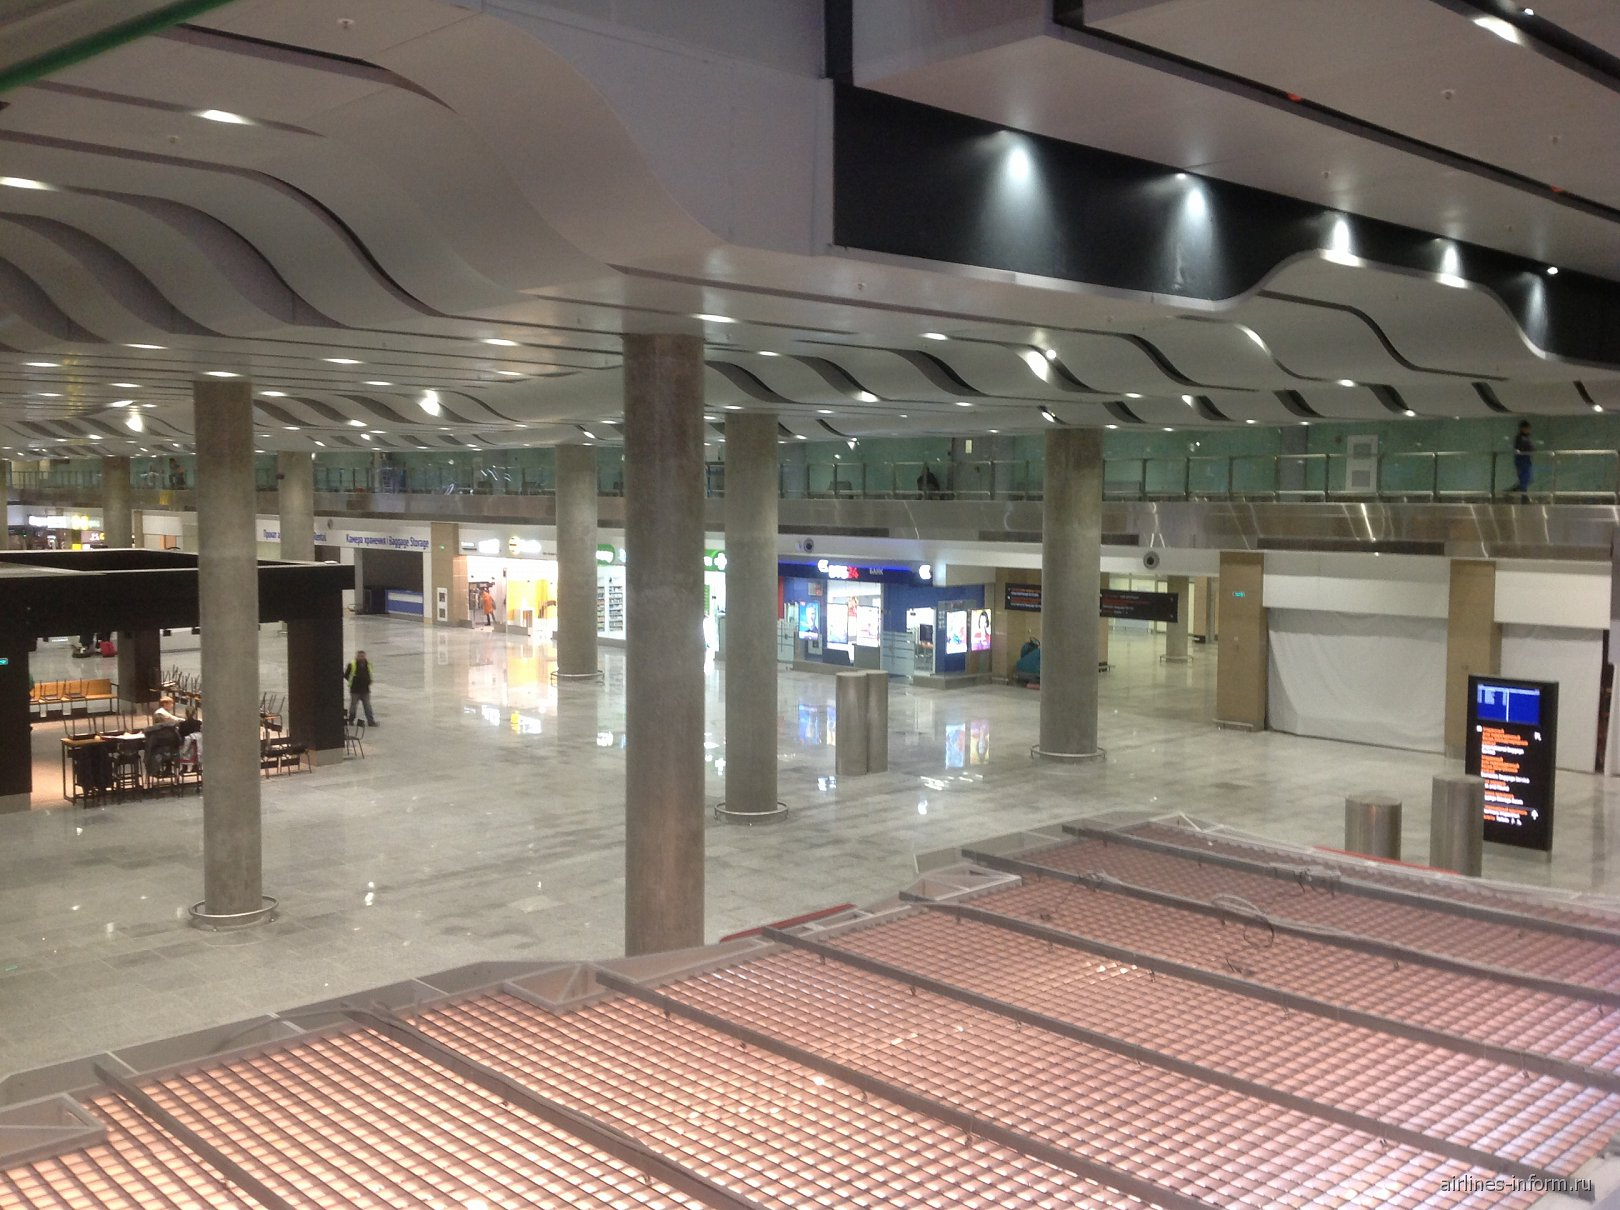 В новом аэровокзале аэропорта Пулково